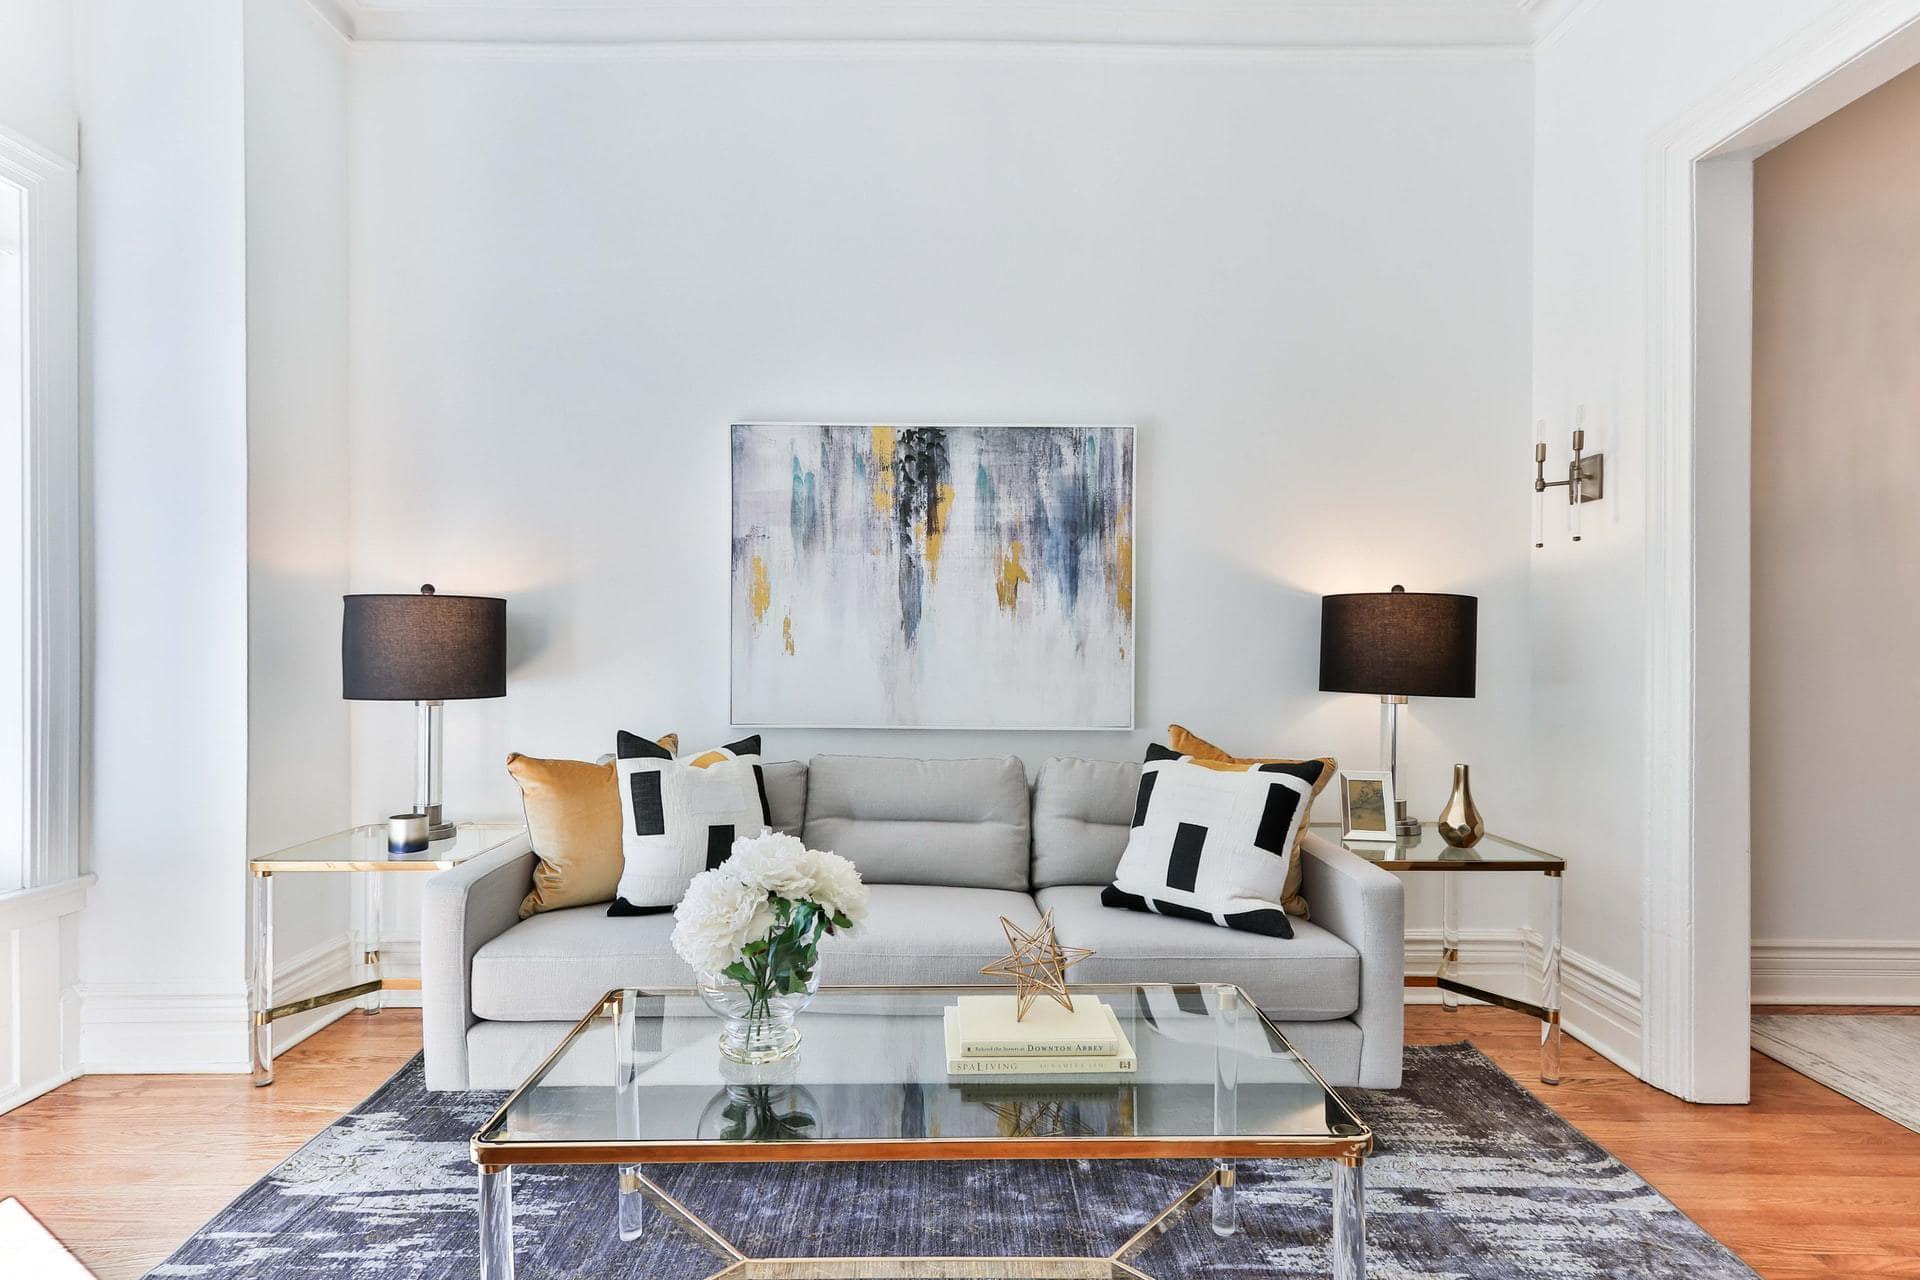 Black, White and Gold Throw Pillows on a Light Grey Sofa